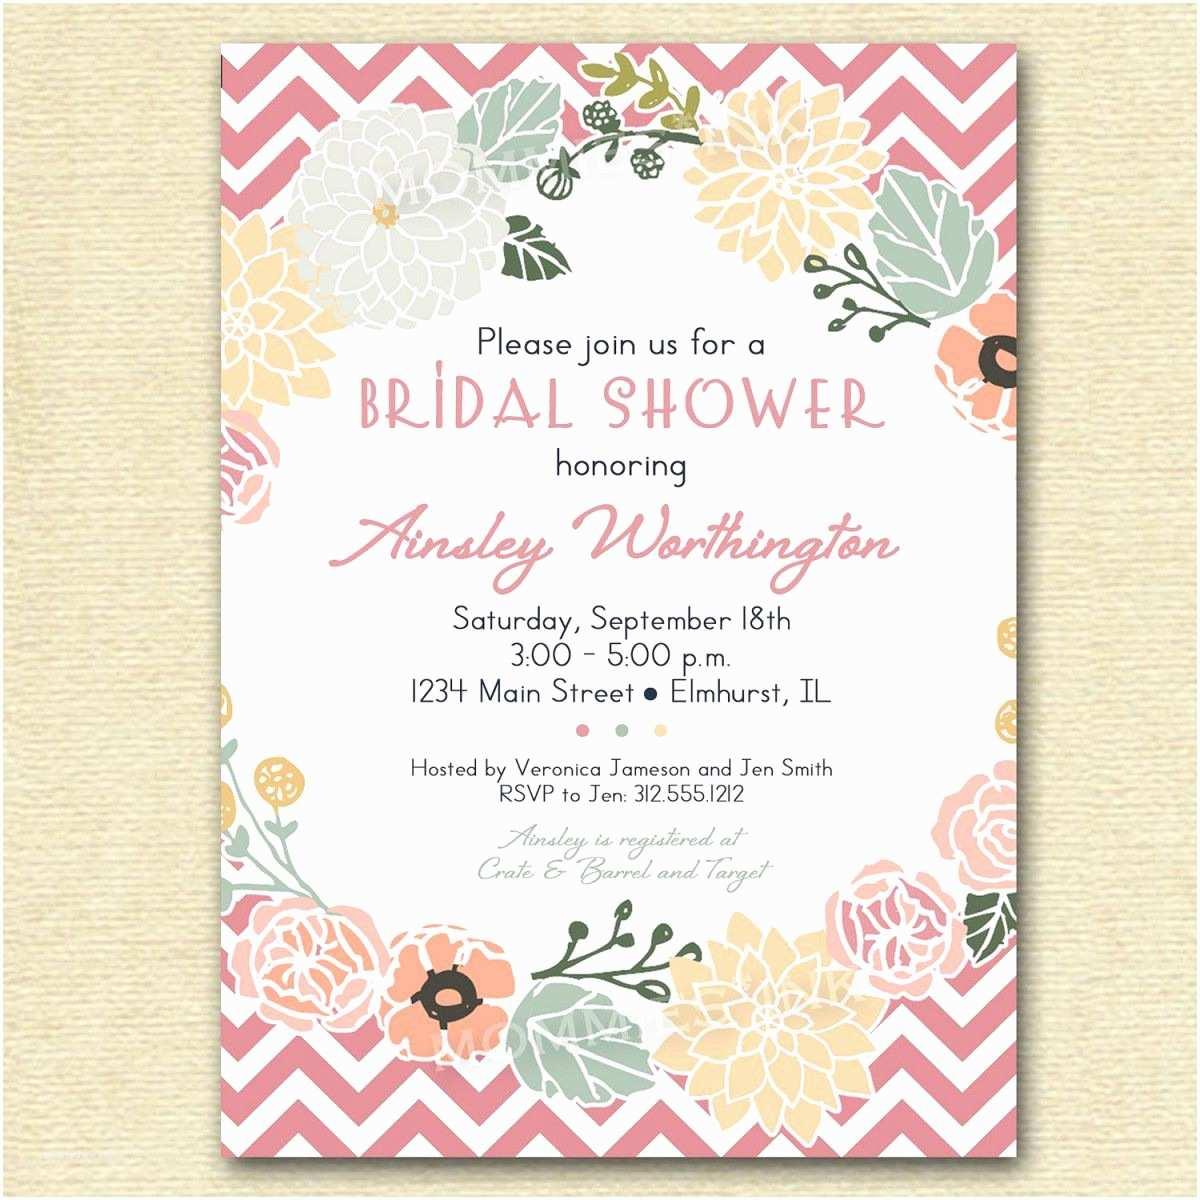 Walmart Wedding Invitations Cheap Wedding Shower Invitations Cheap Bridal Shower